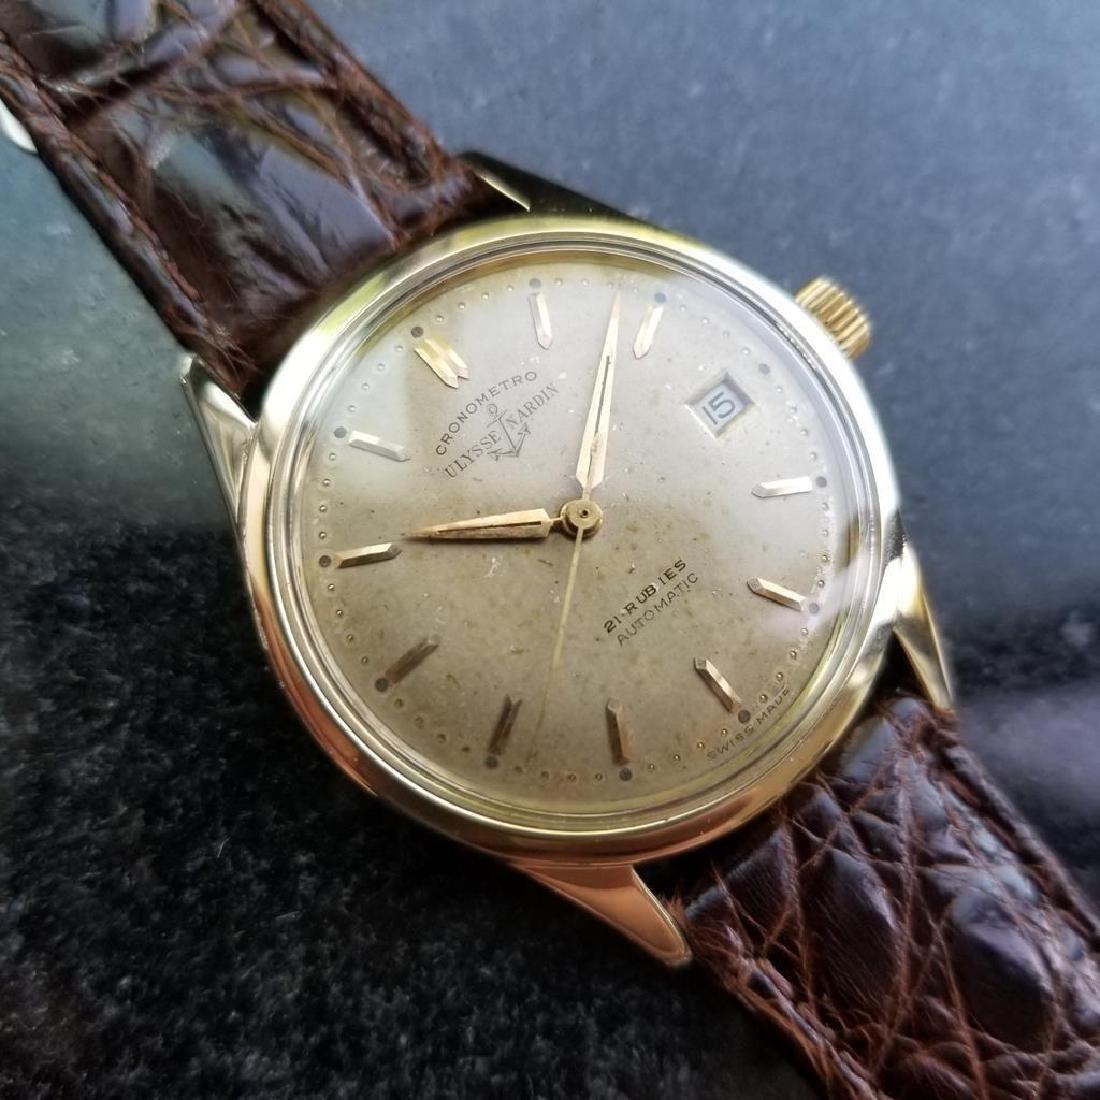 Vintage ULYSSE NARDIN Chronometer Automatic w/ date - 4